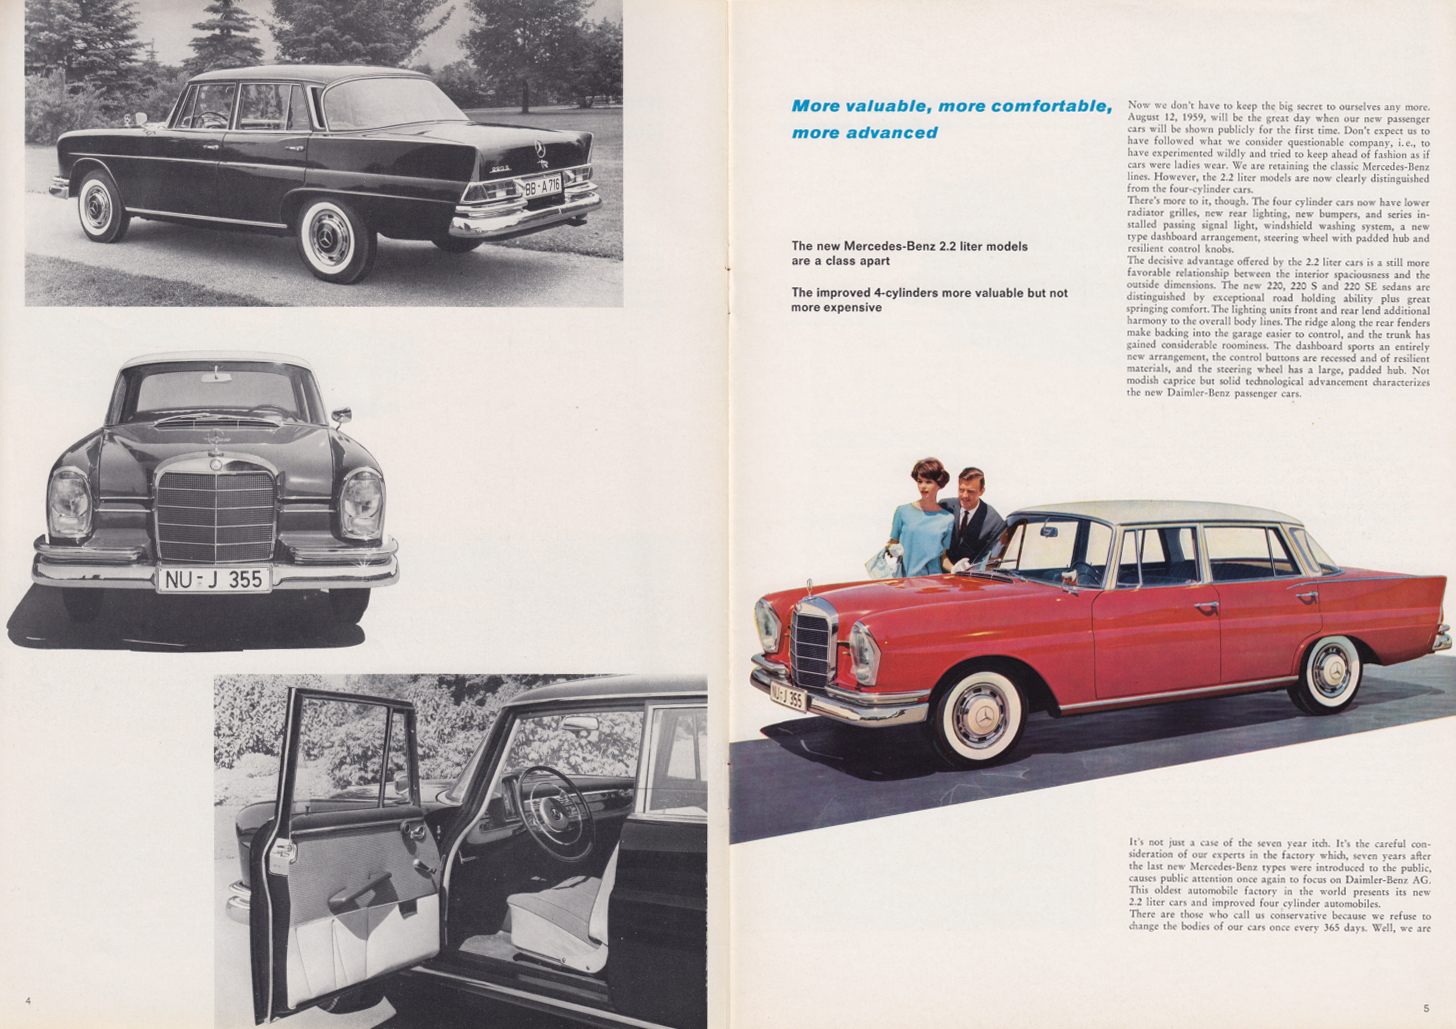 (REVISTA): Periódico In aller welt n.º 34 - Mercedes-Benz no mundo - 1959 - multilingue 003